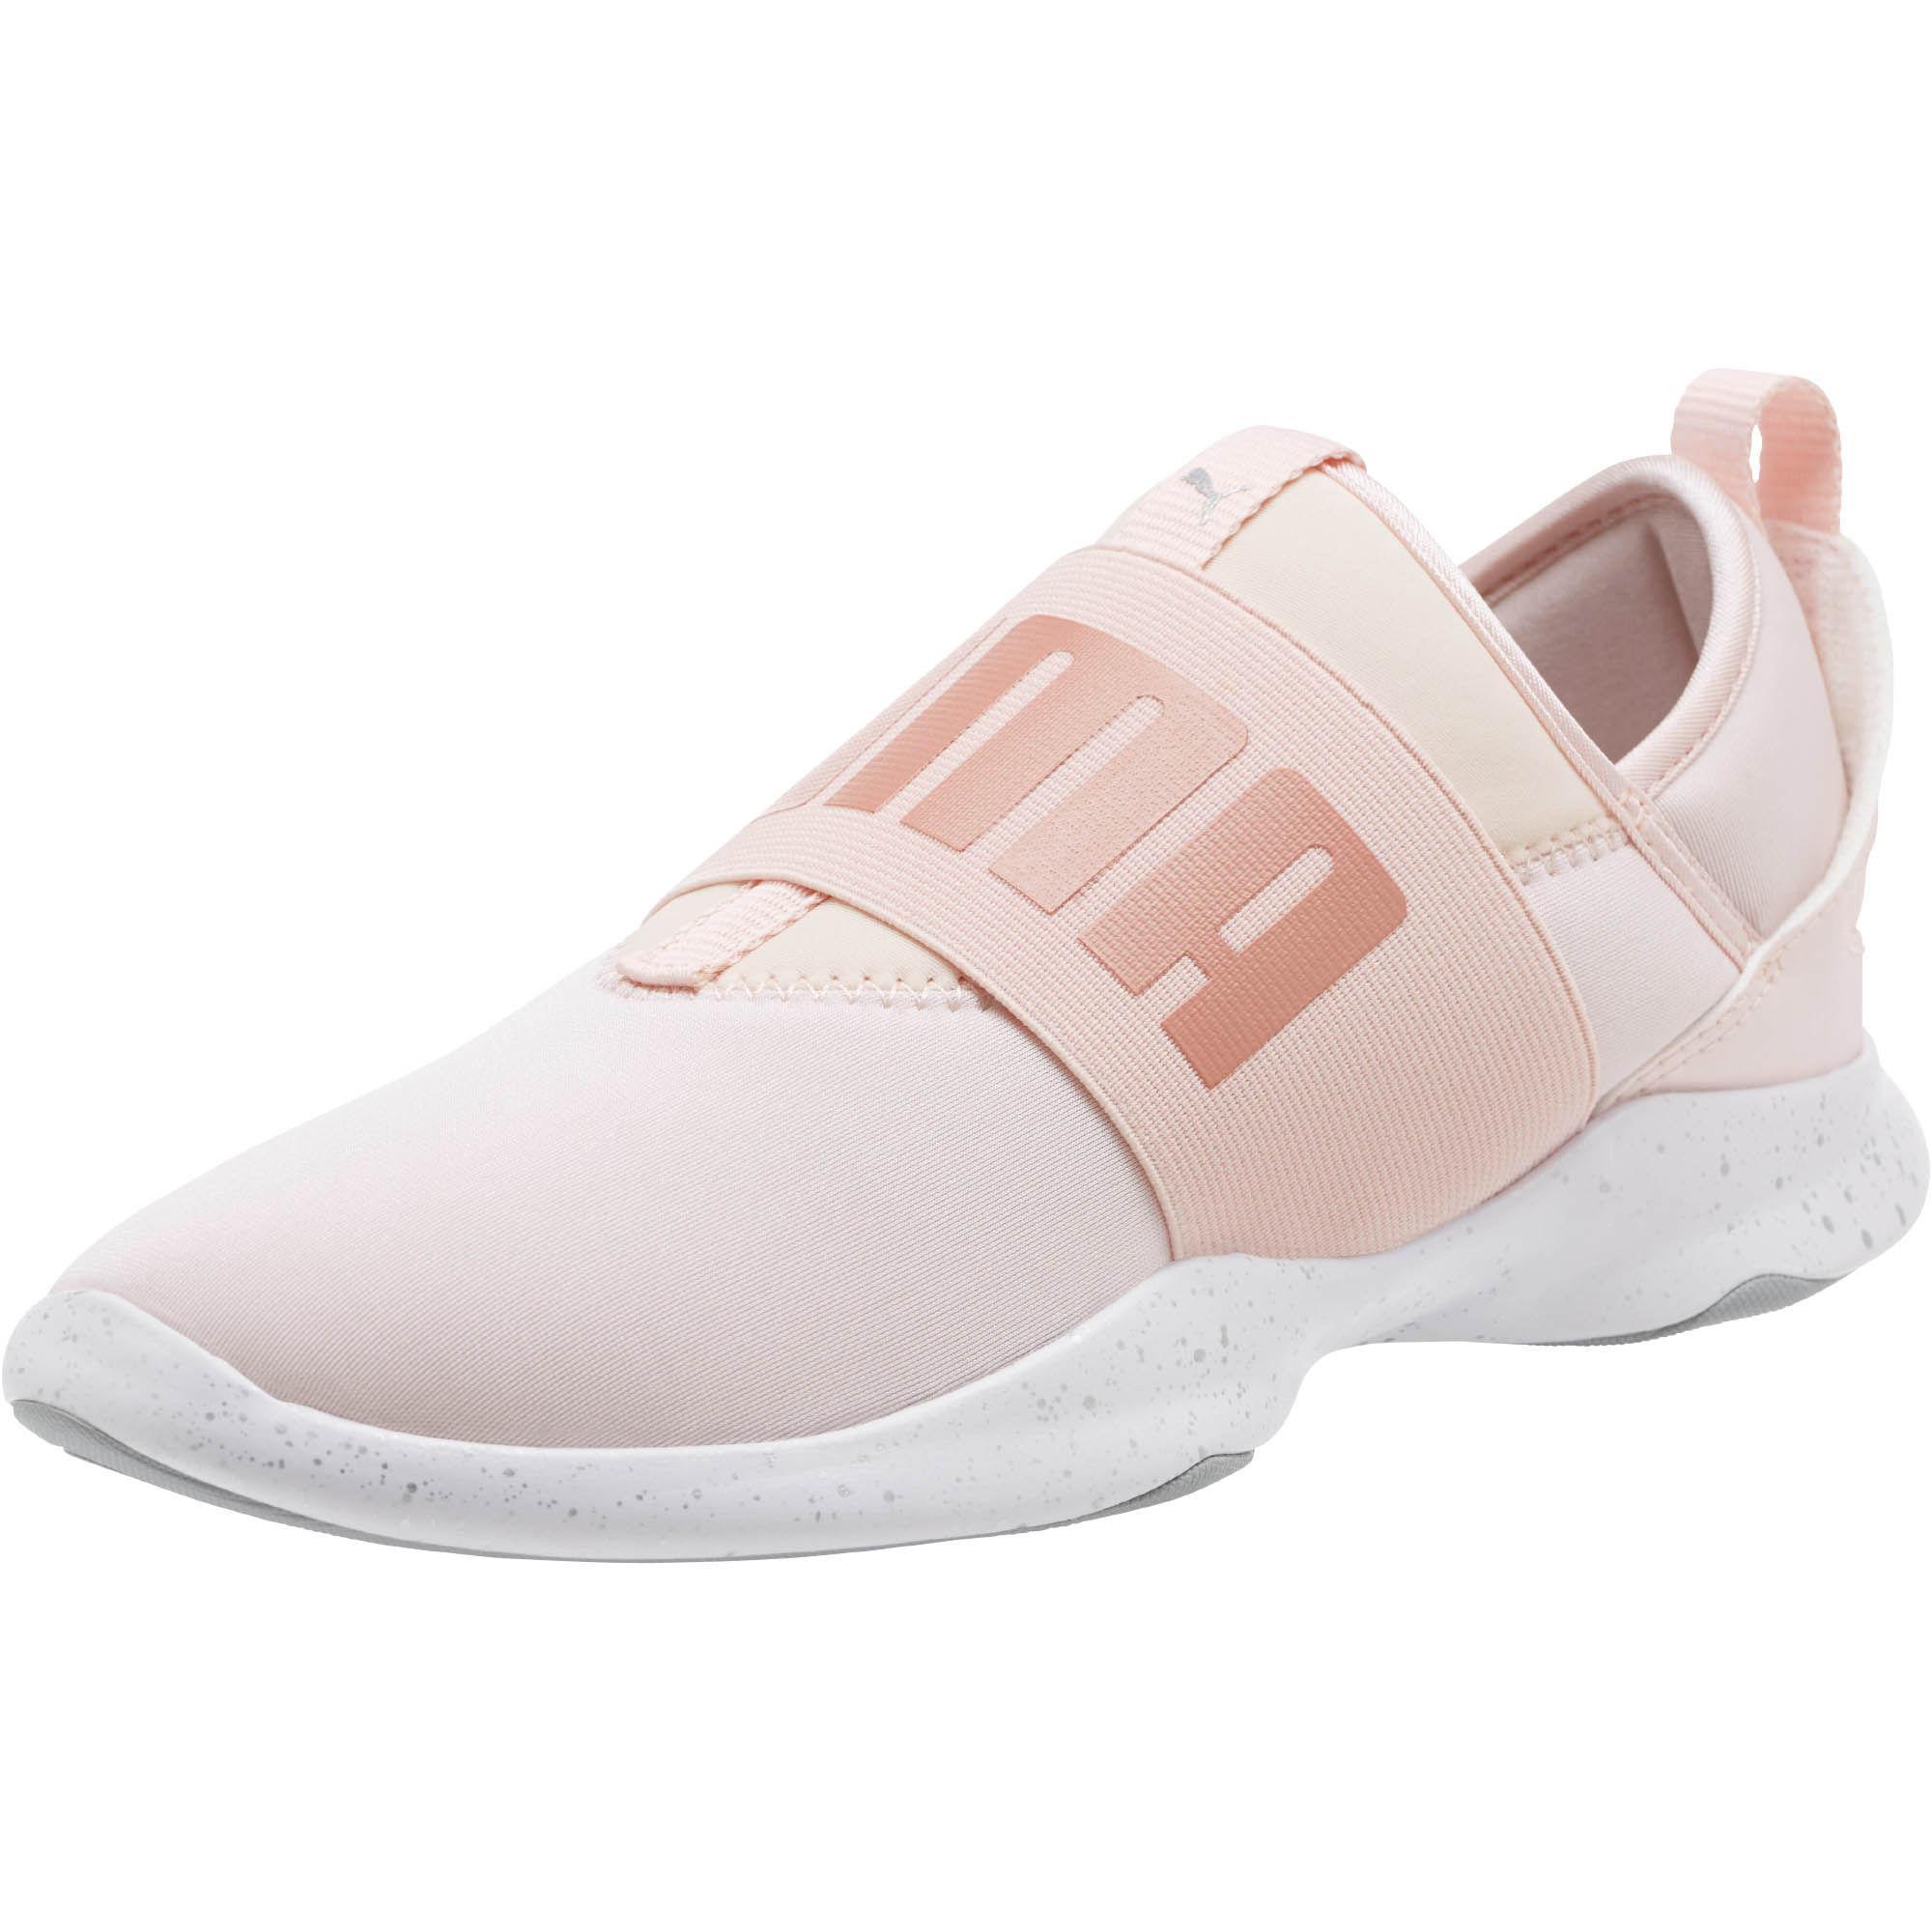 Lyst - PUMA Dare Speckles Women s Sneakers in Pink 32cfcc2b6